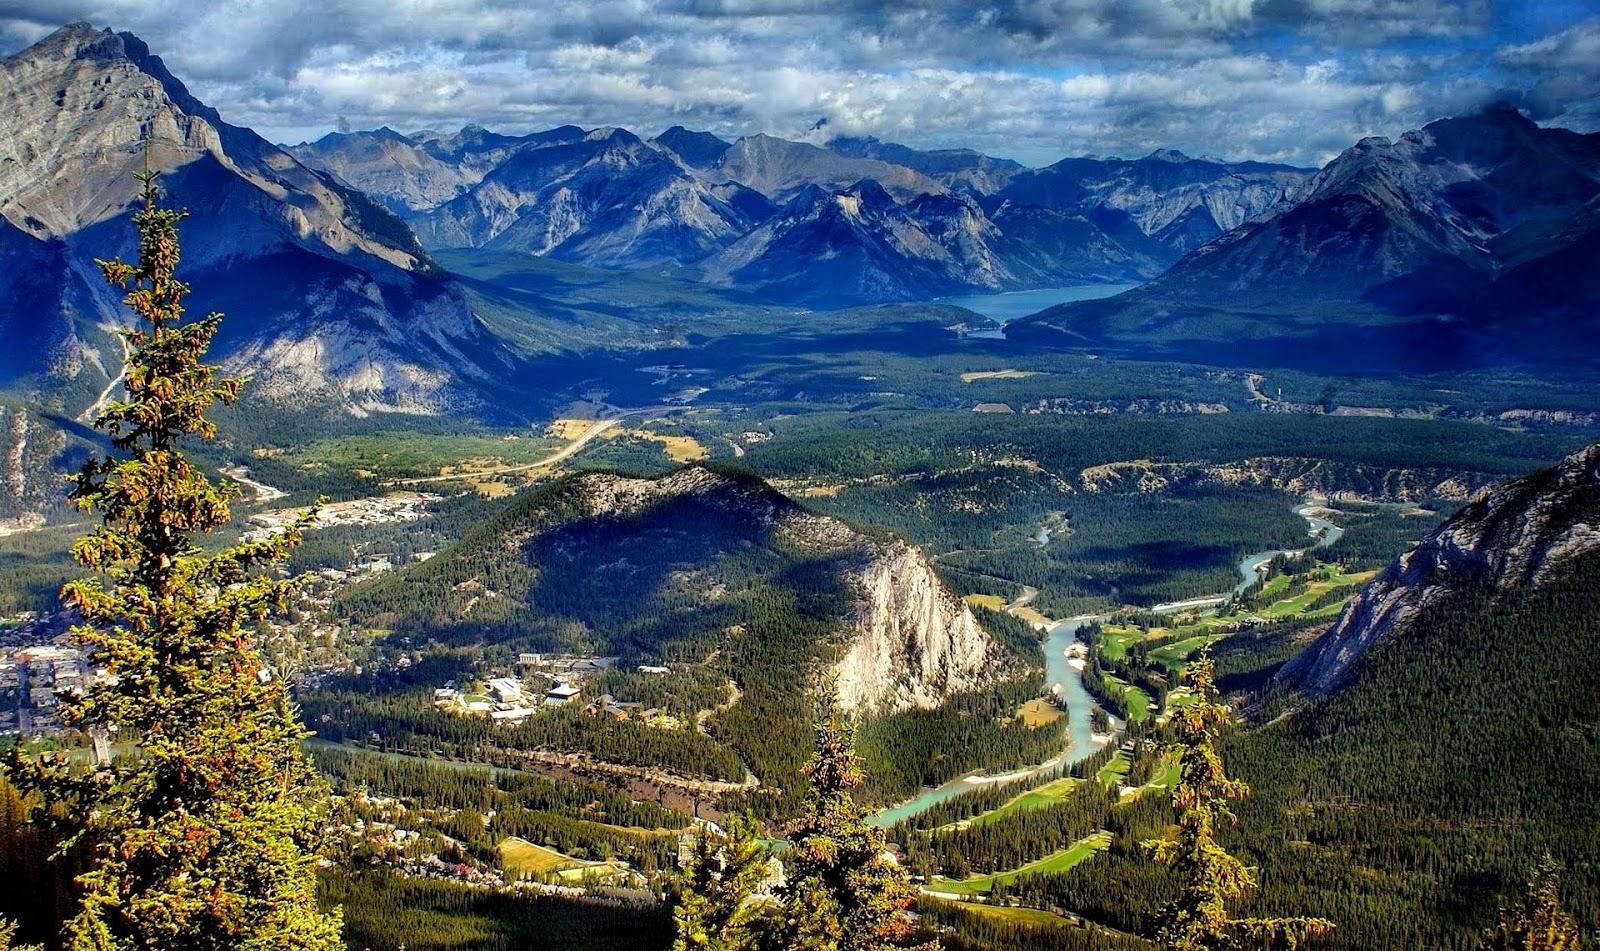 Banff national park, alberta, canada, summer - Wallpapers Pics